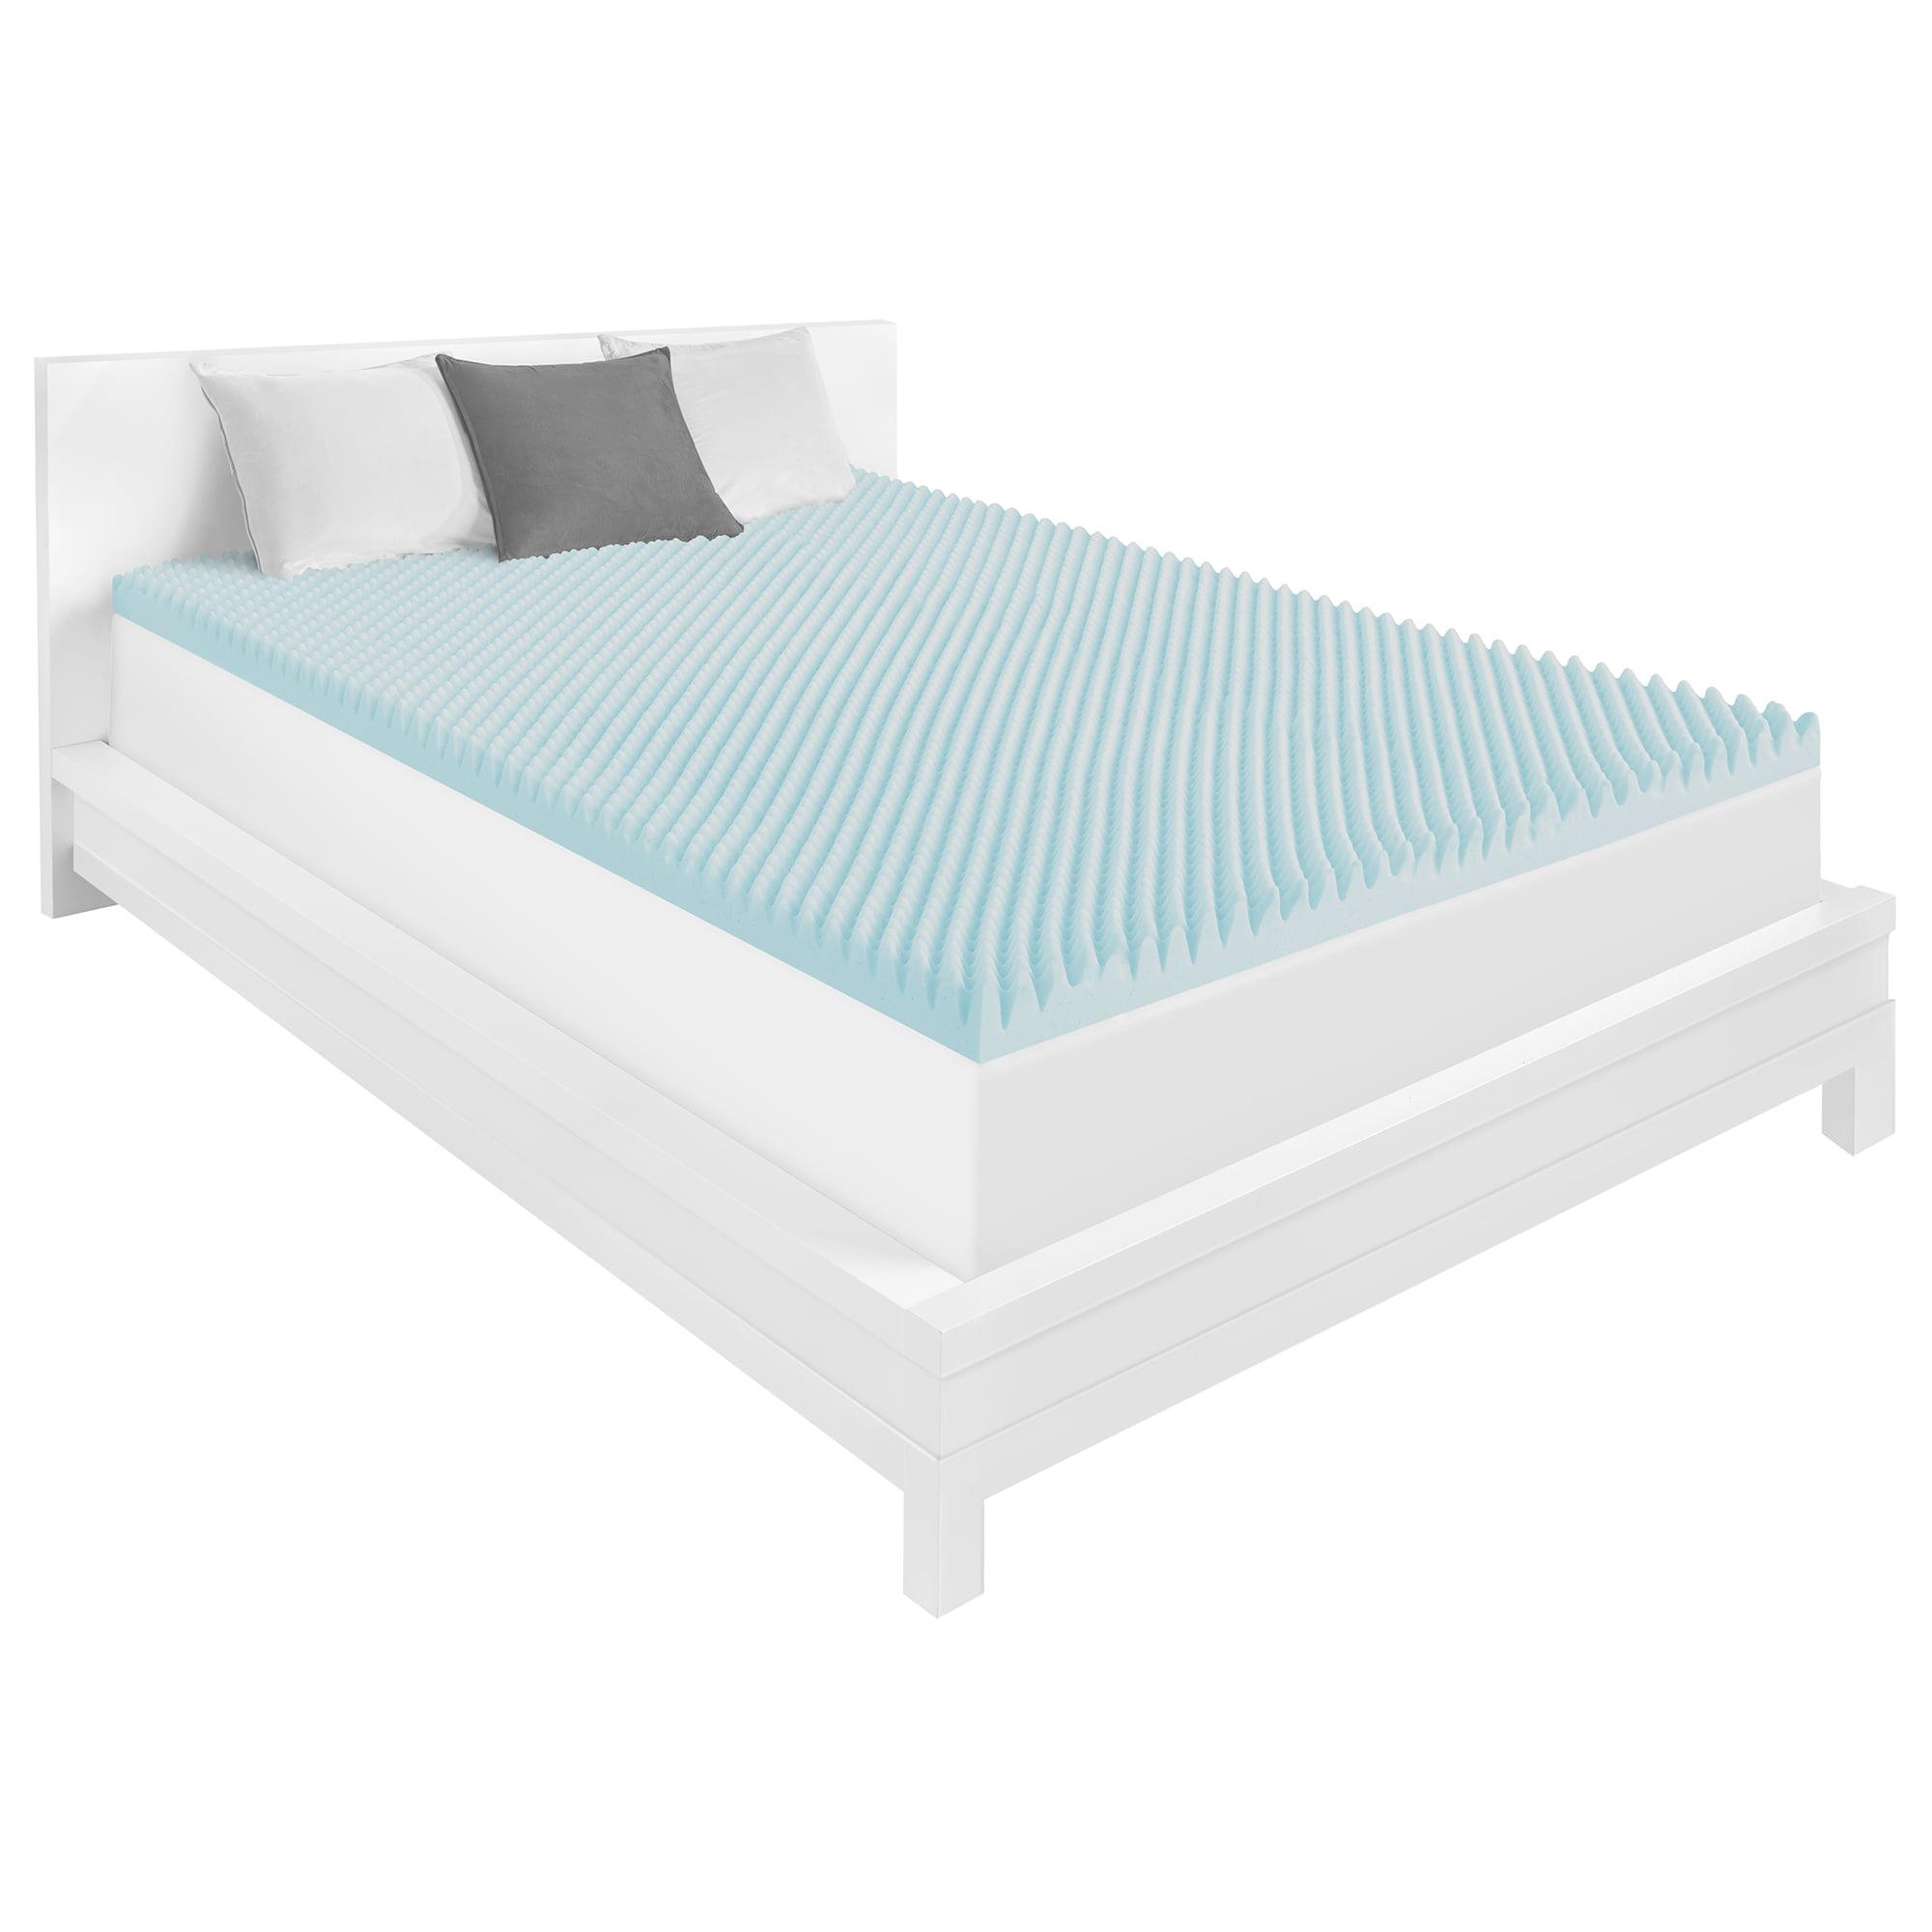 dream serenity 3 inch gel memory foam convoluted mattress topper. Black Bedroom Furniture Sets. Home Design Ideas